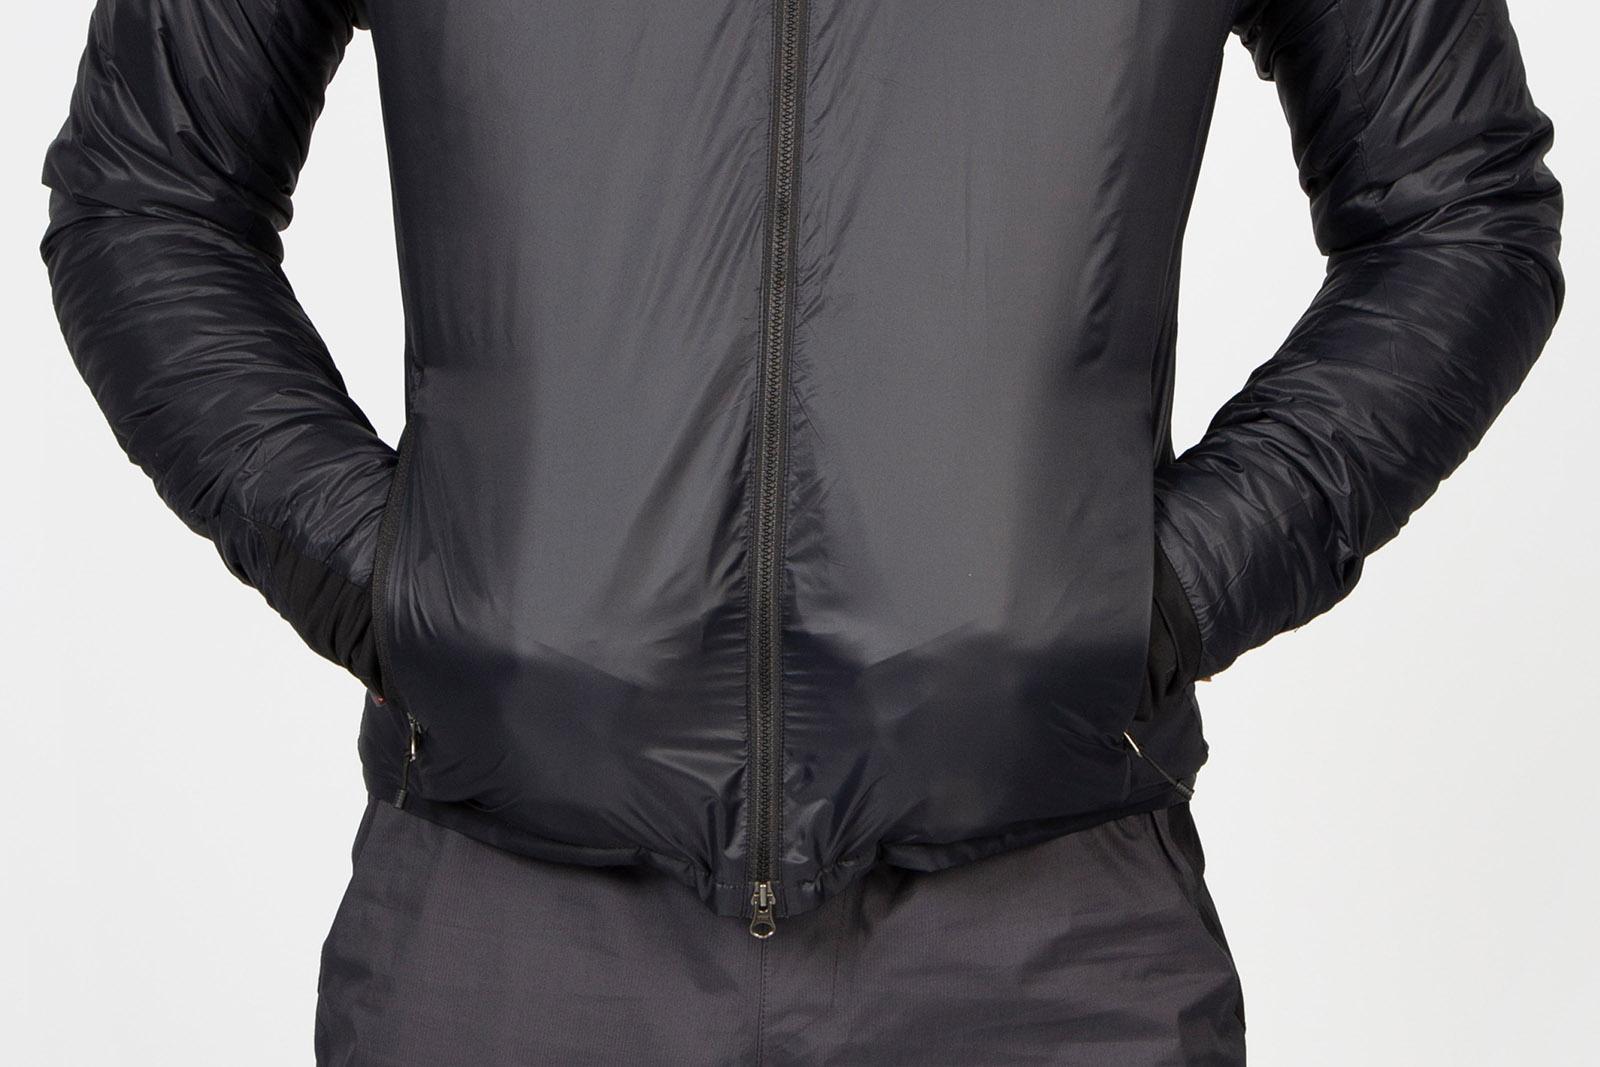 a man wears the endura gv500 insulated jacket